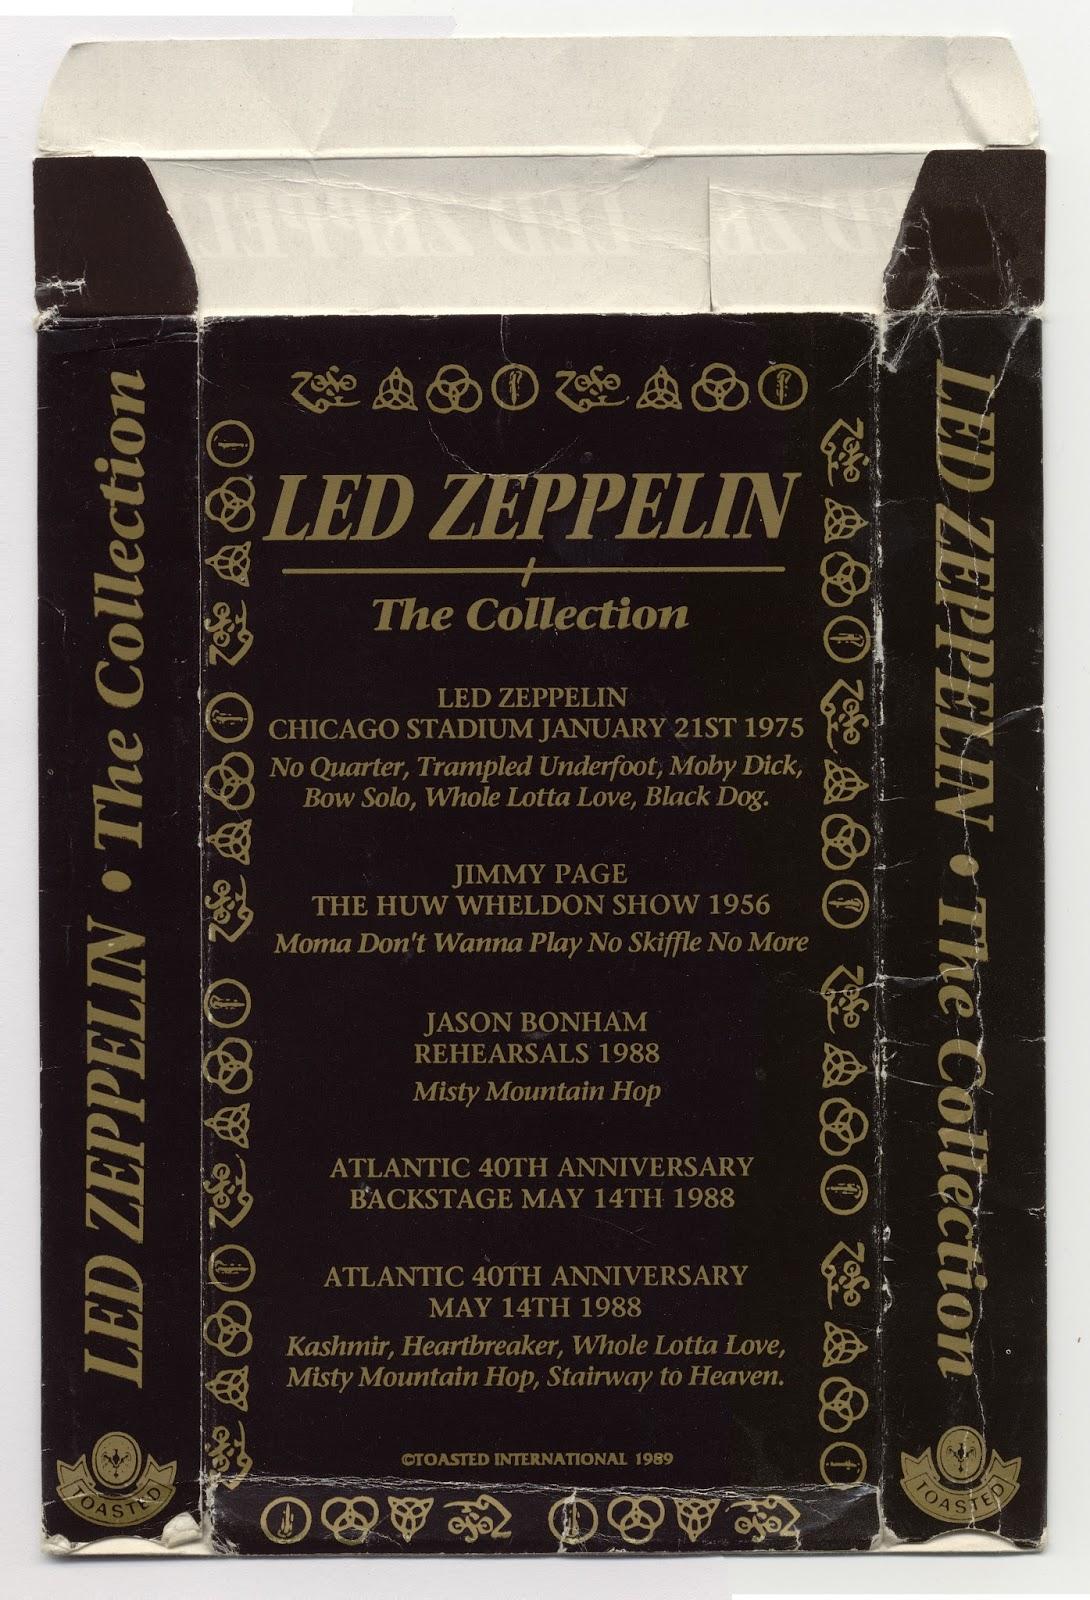 long live led zeppelin led zeppelin the collection toasted video 1990 dvd. Black Bedroom Furniture Sets. Home Design Ideas